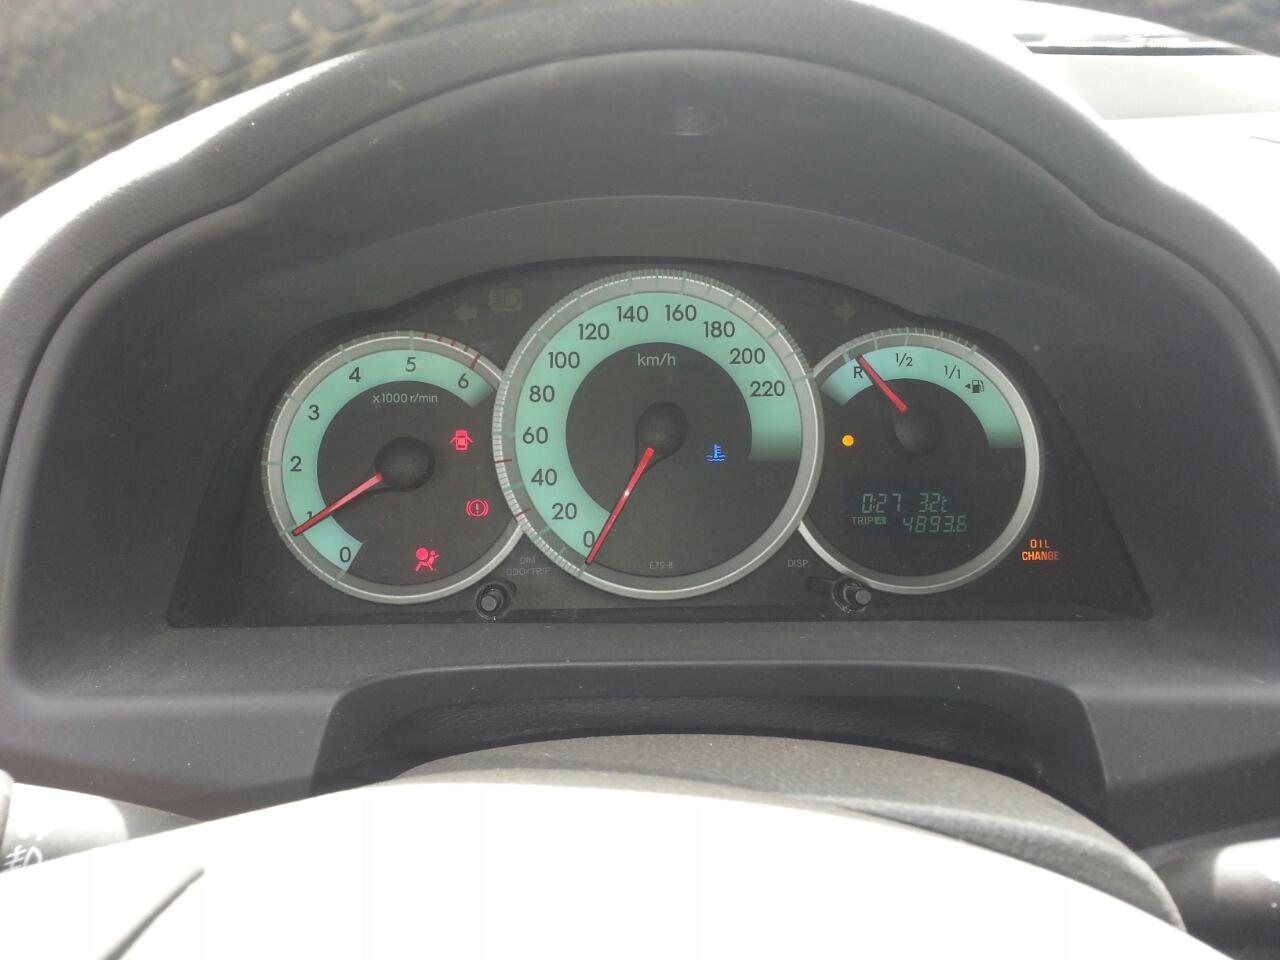 Toyota corolla Verso. Navigation